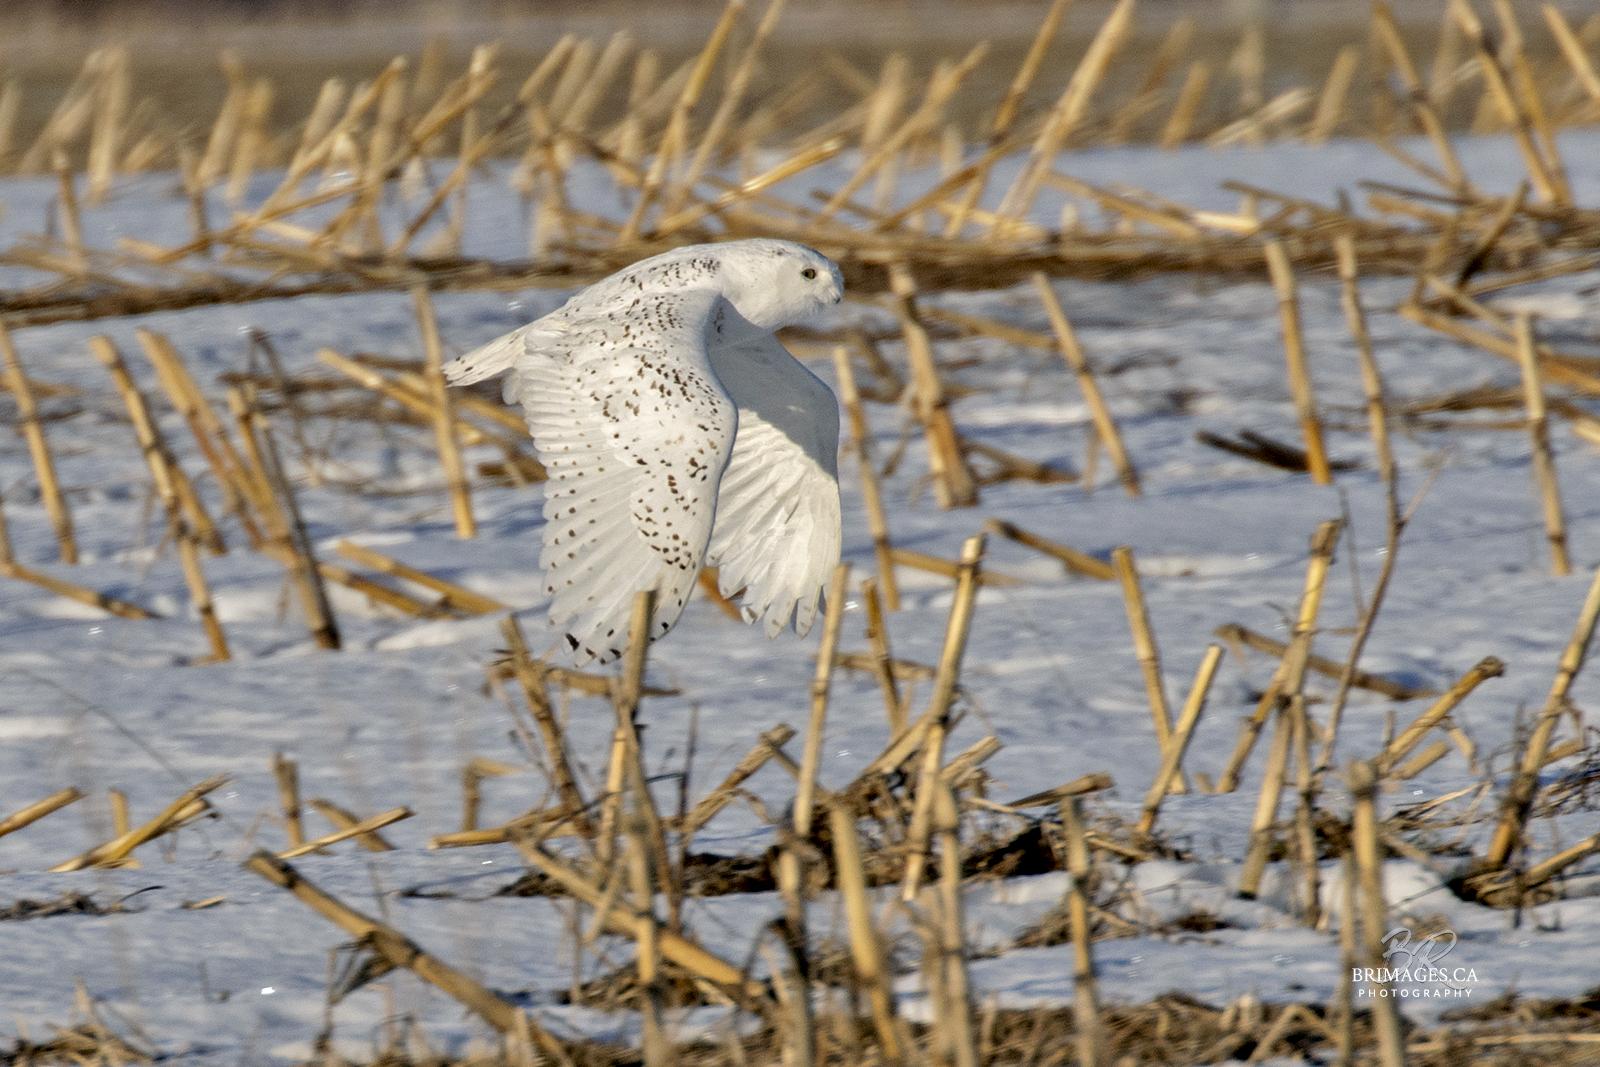 snowy-owl-in-flight-new-brunswick-BRimages.ca